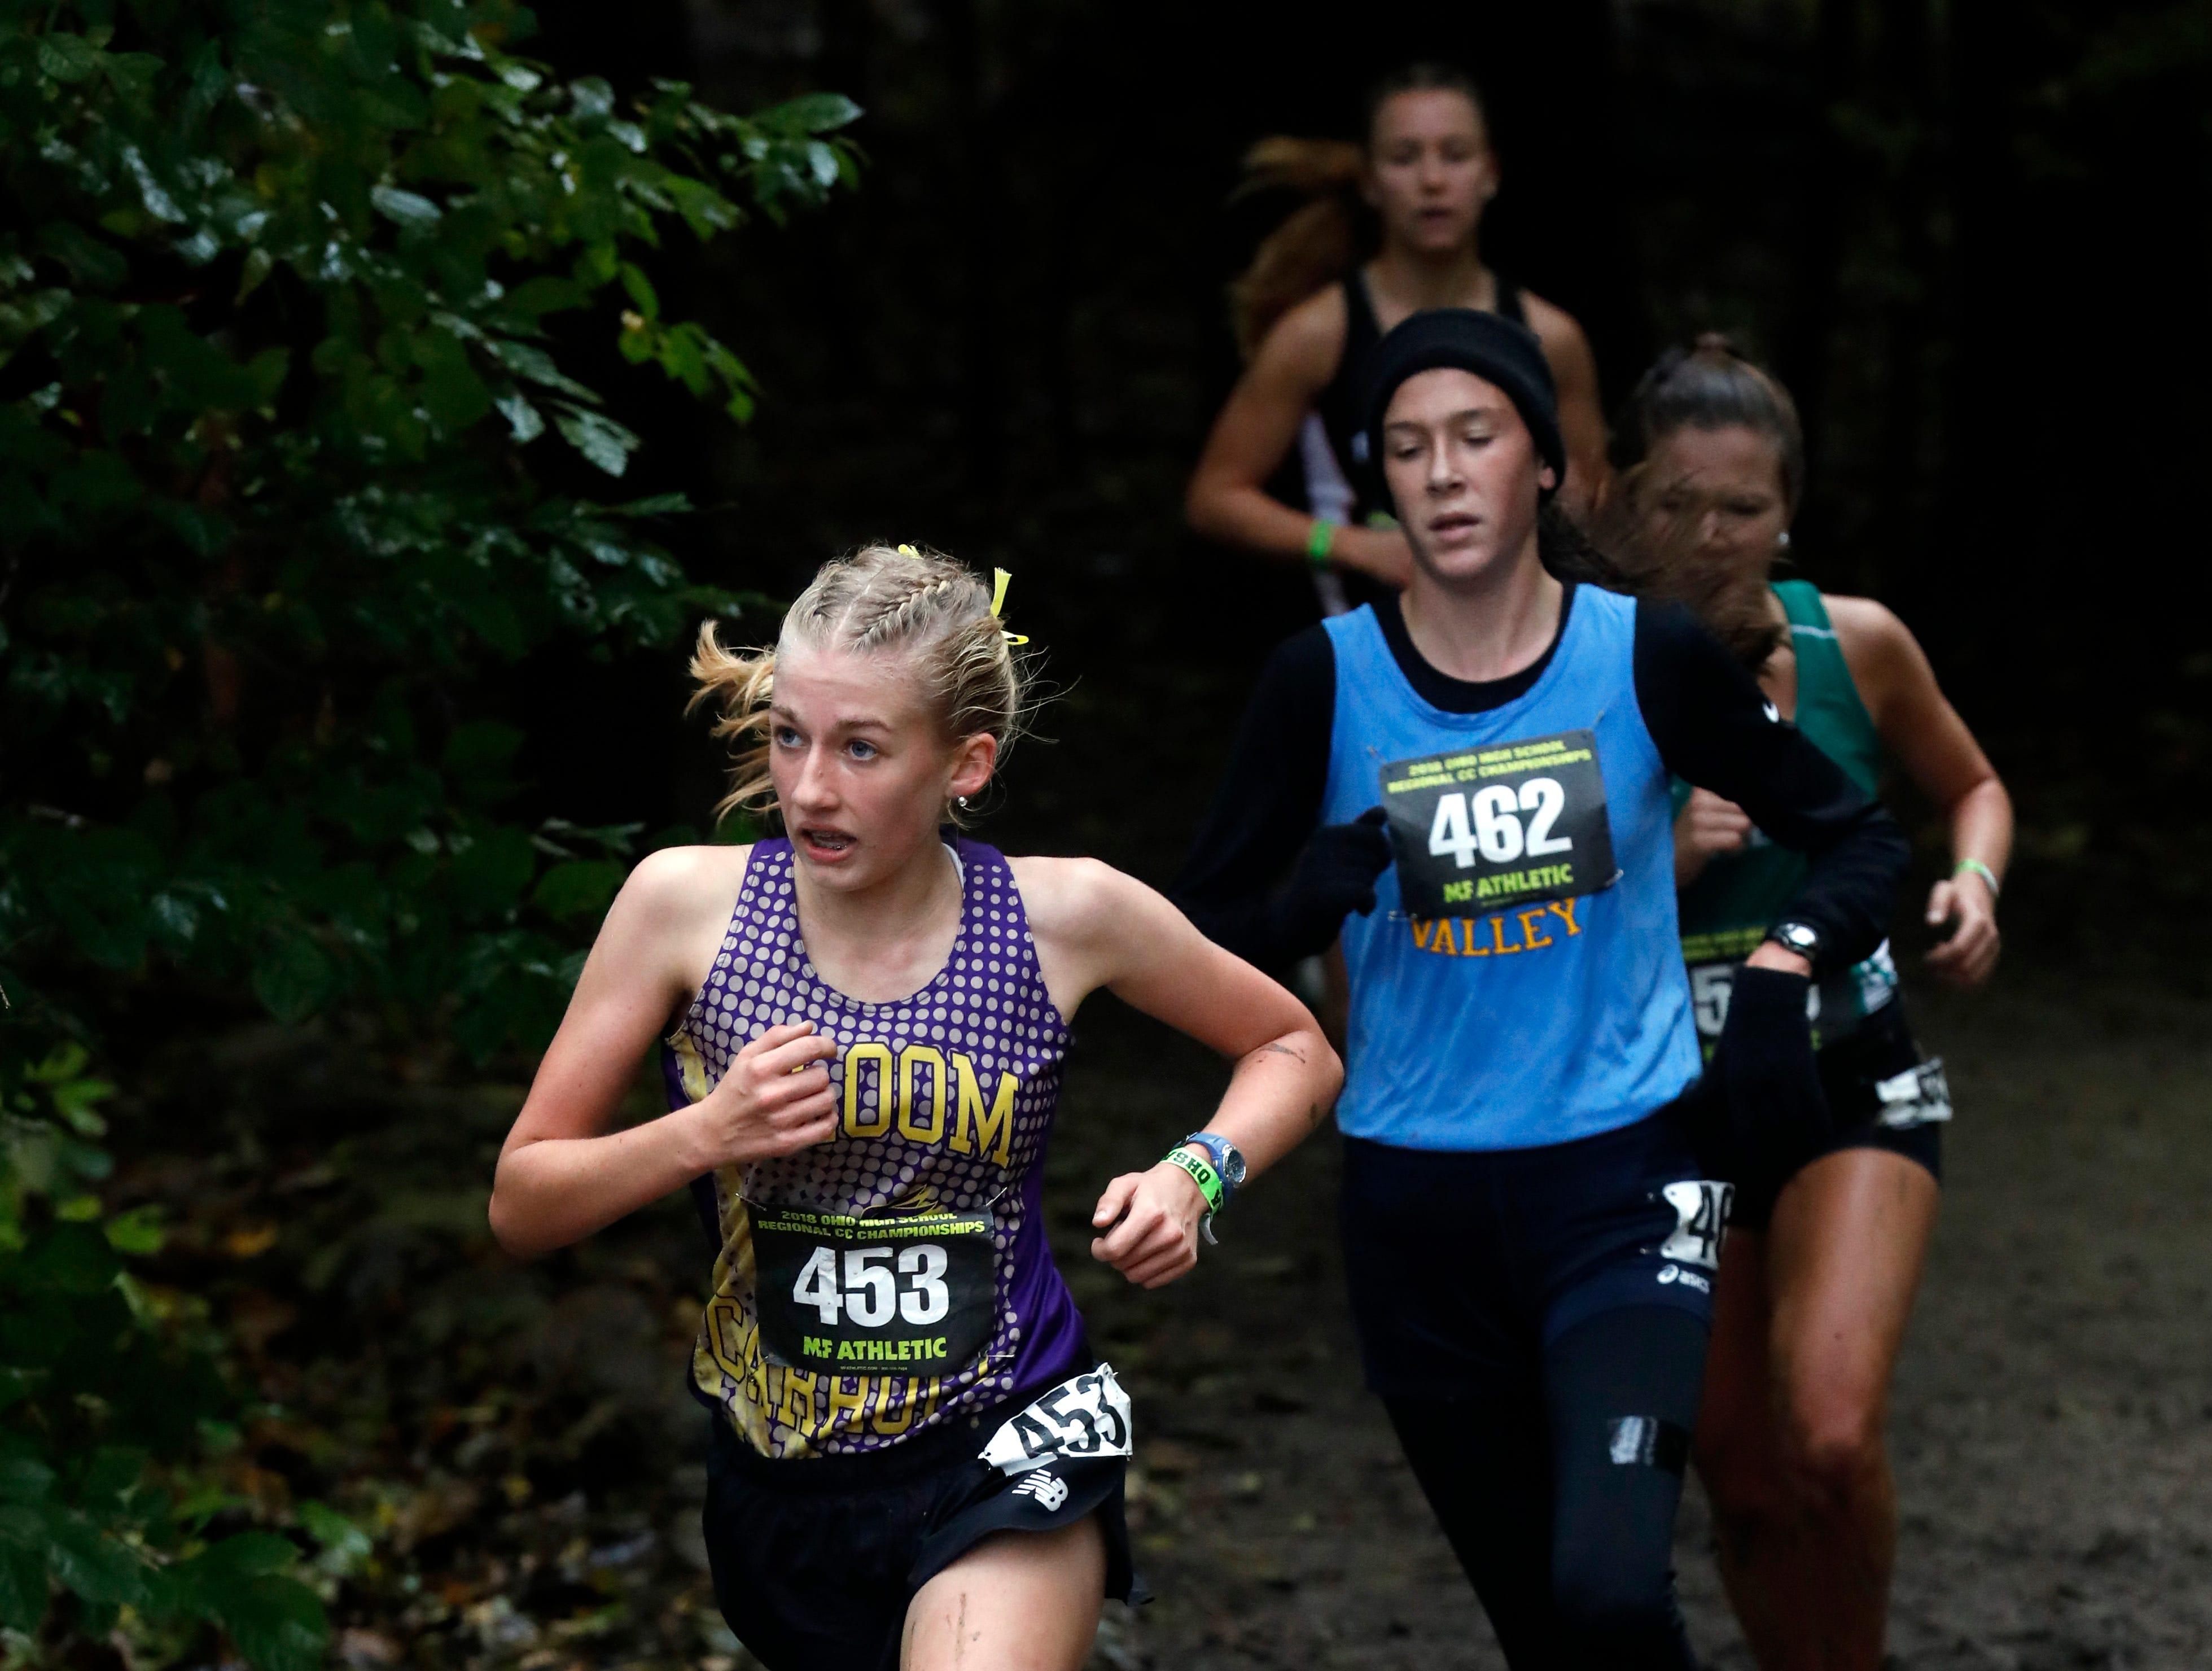 Bloom-Carroll's Abigail Matthews runs in the Regional Cross Country meet Saturday, Oct. 27, 2018, at Pickerington North High School in Pickerington.